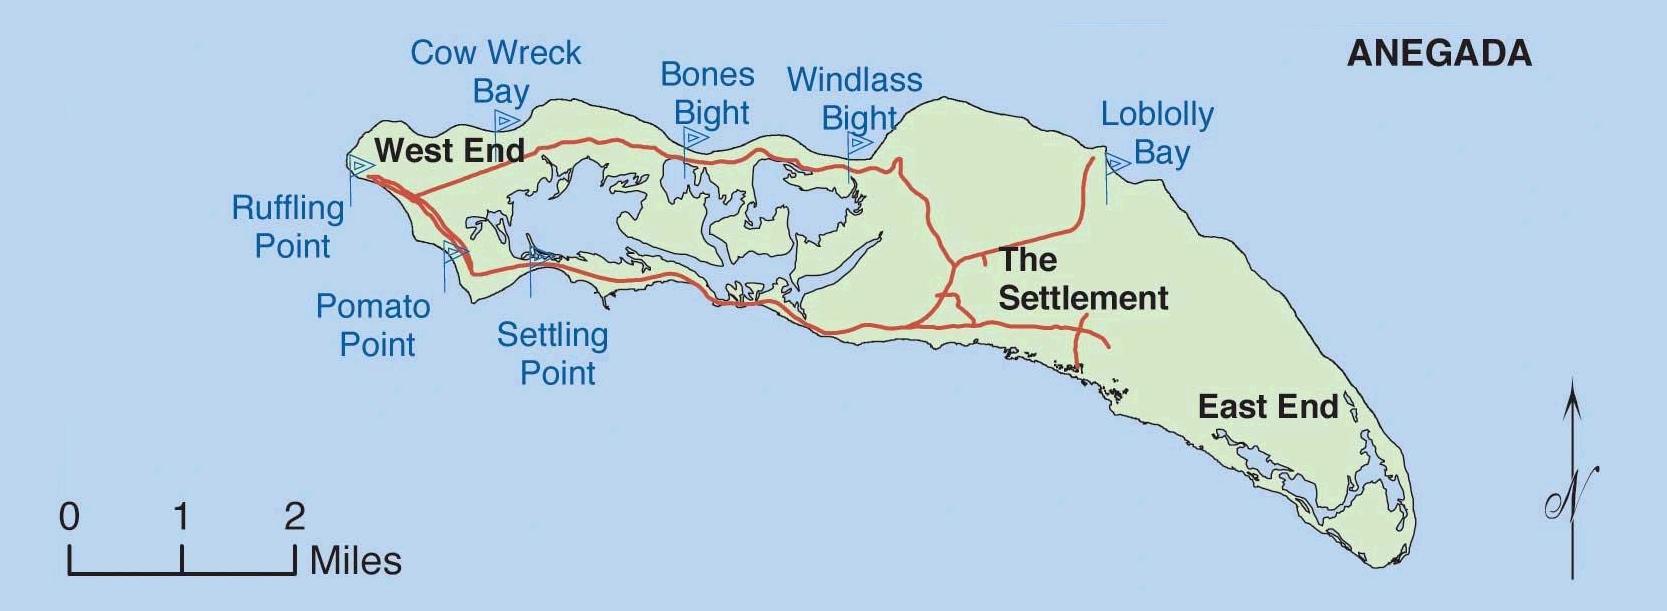 Map of Anegada island